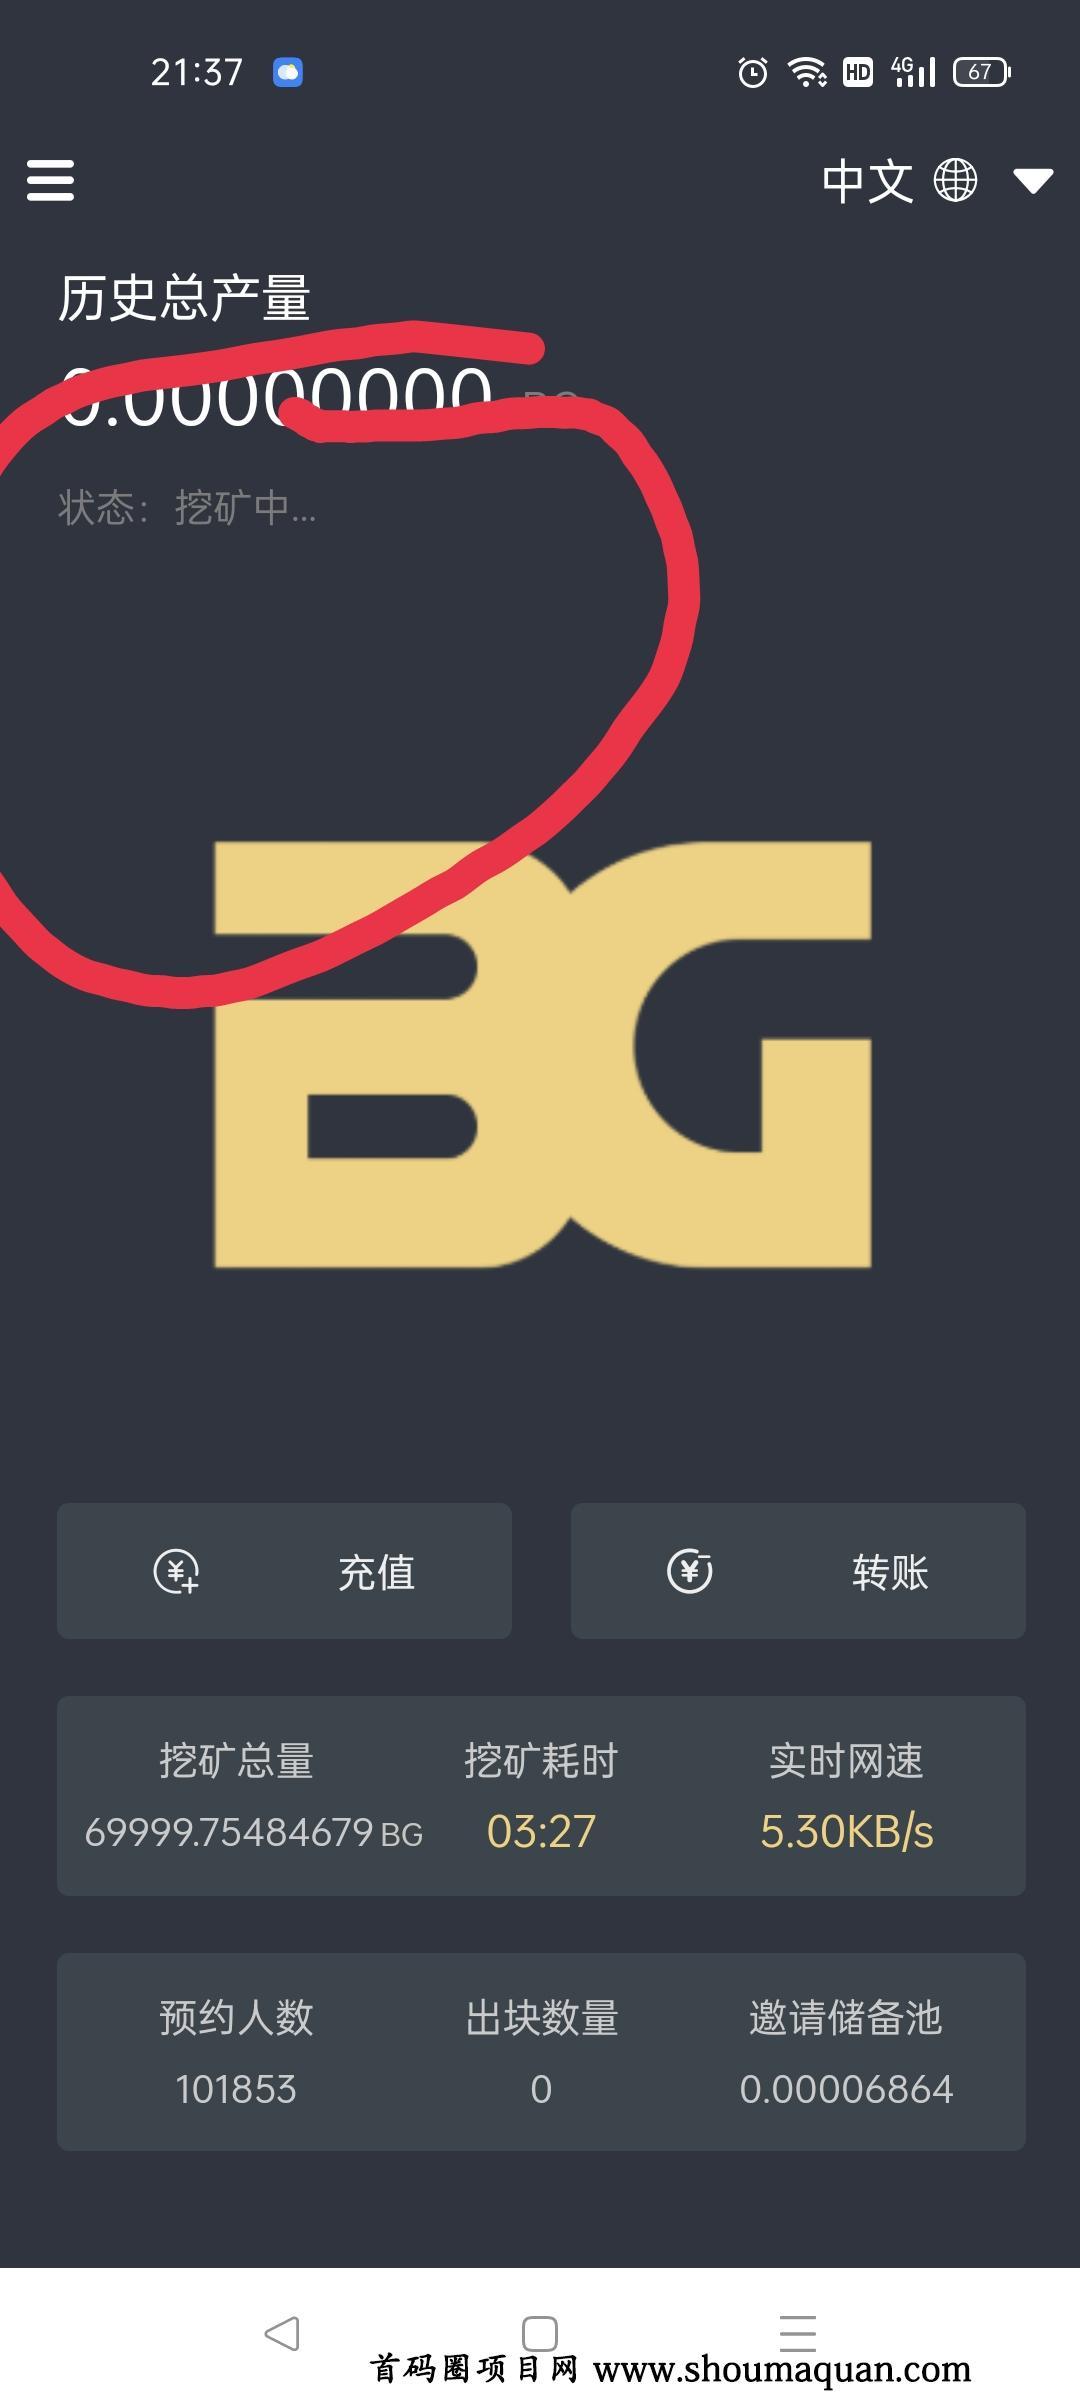 BG正式开挖,一币一万u的零撸